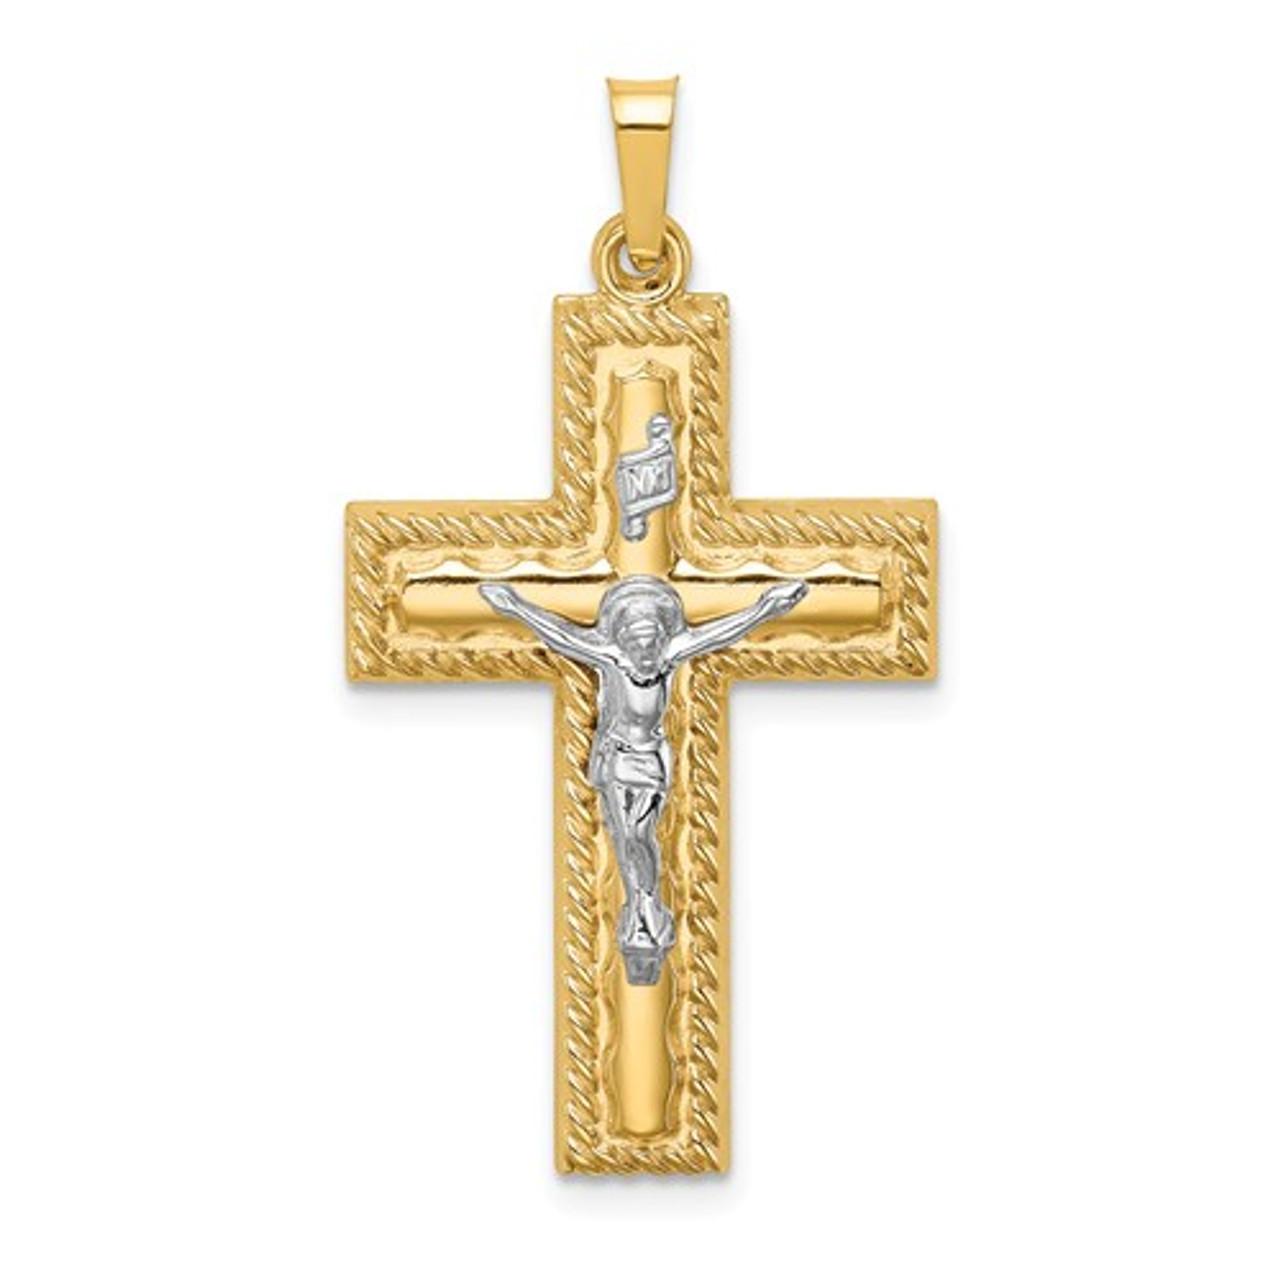 14k Two-tone Hollow Crucifix Pendant New Charm